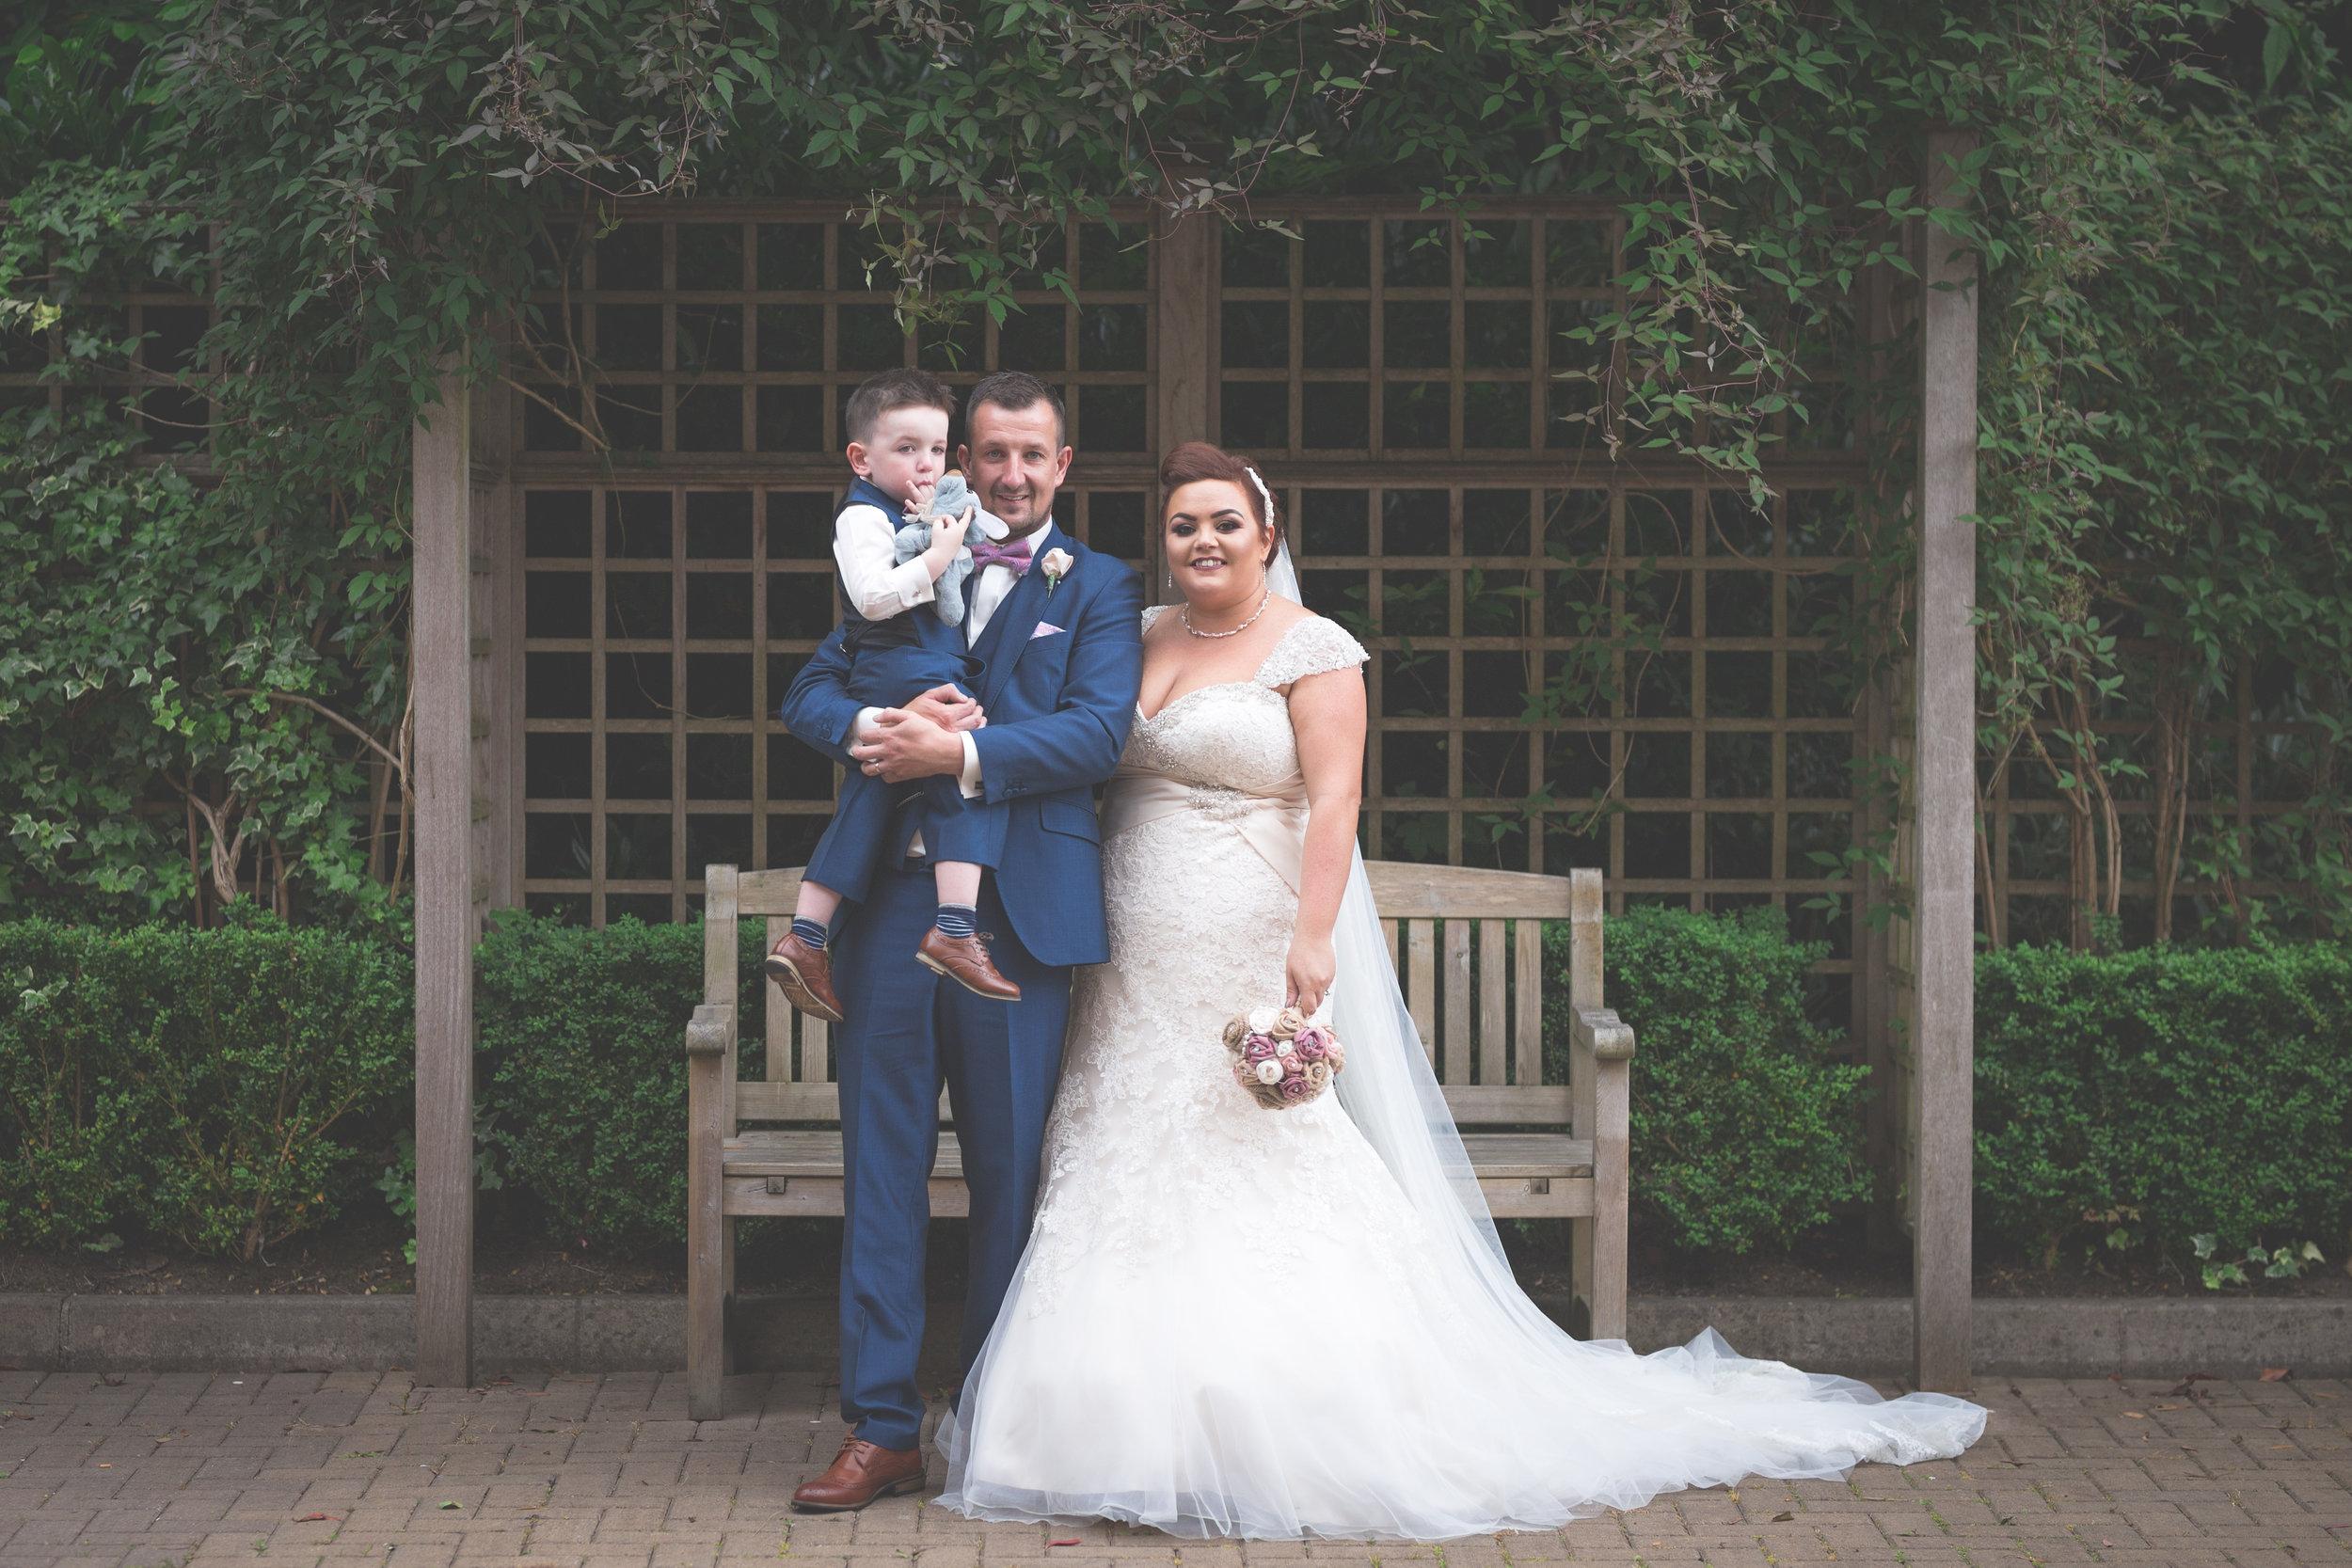 Antoinette & Stephen - Portraits   Brian McEwan Photography   Wedding Photographer Northern Ireland 47.jpg